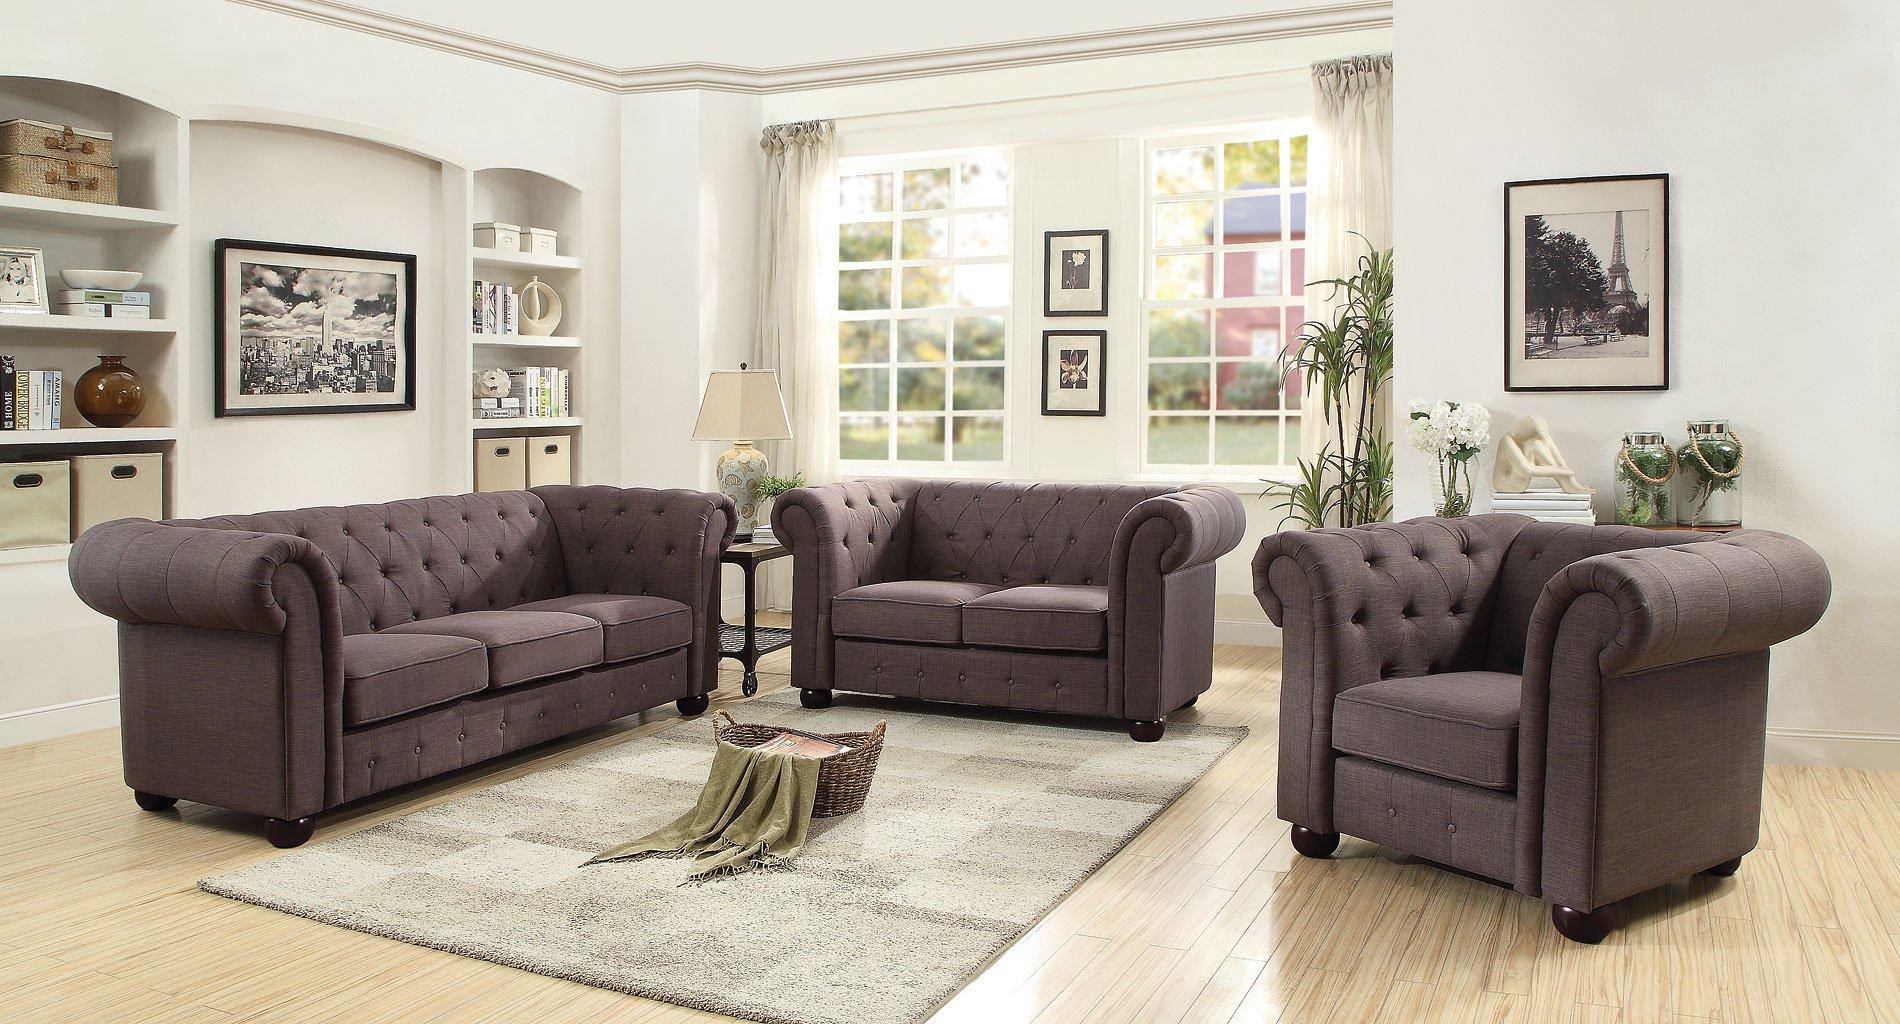 G499 tufted living room set ash gray